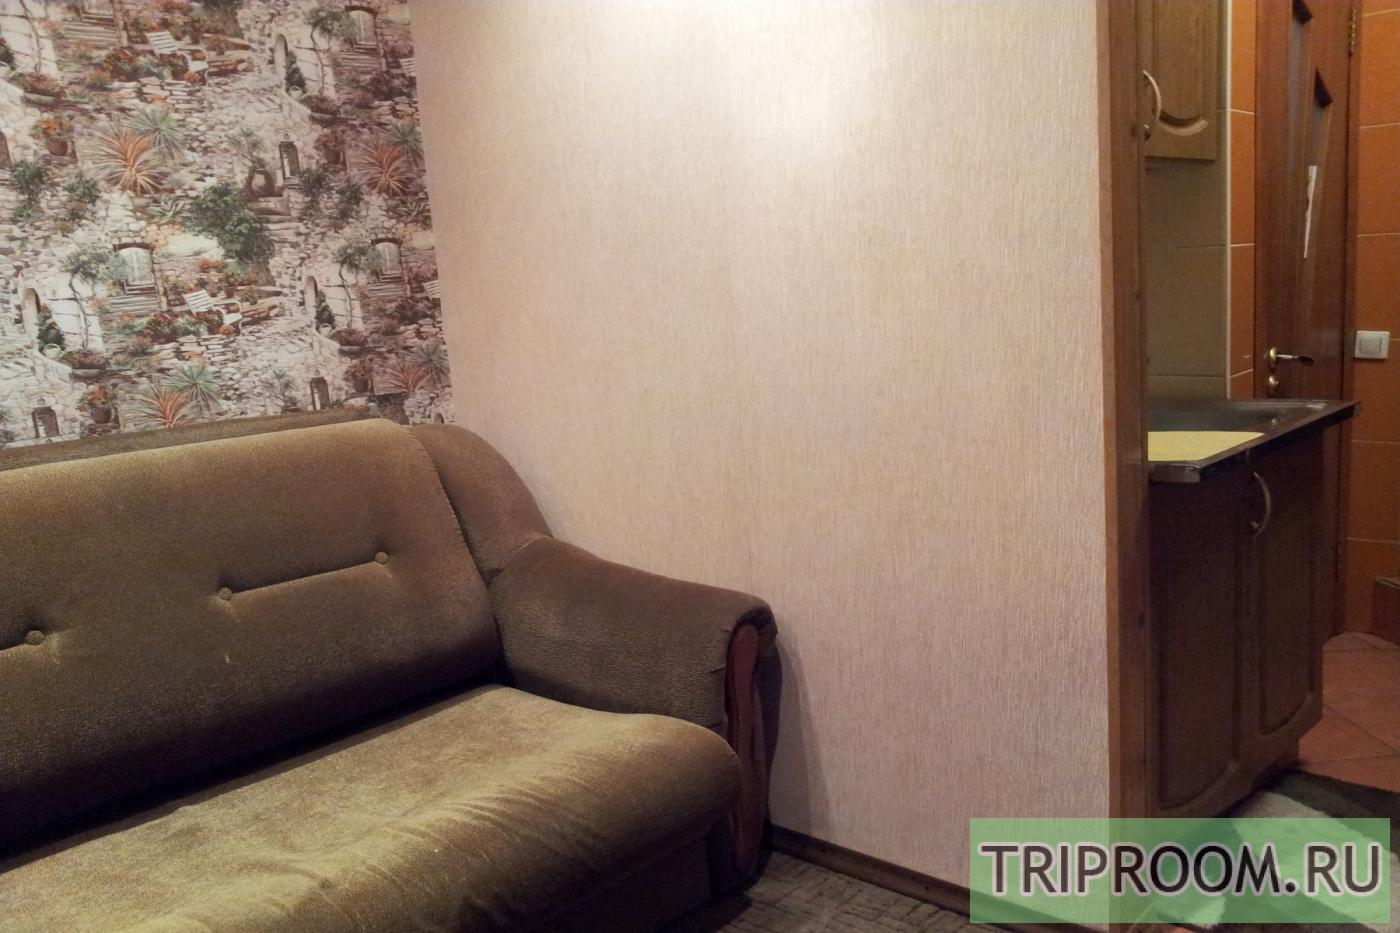 1-комнатная квартира посуточно (вариант № 30855), ул. Кузнецова улица, фото № 4